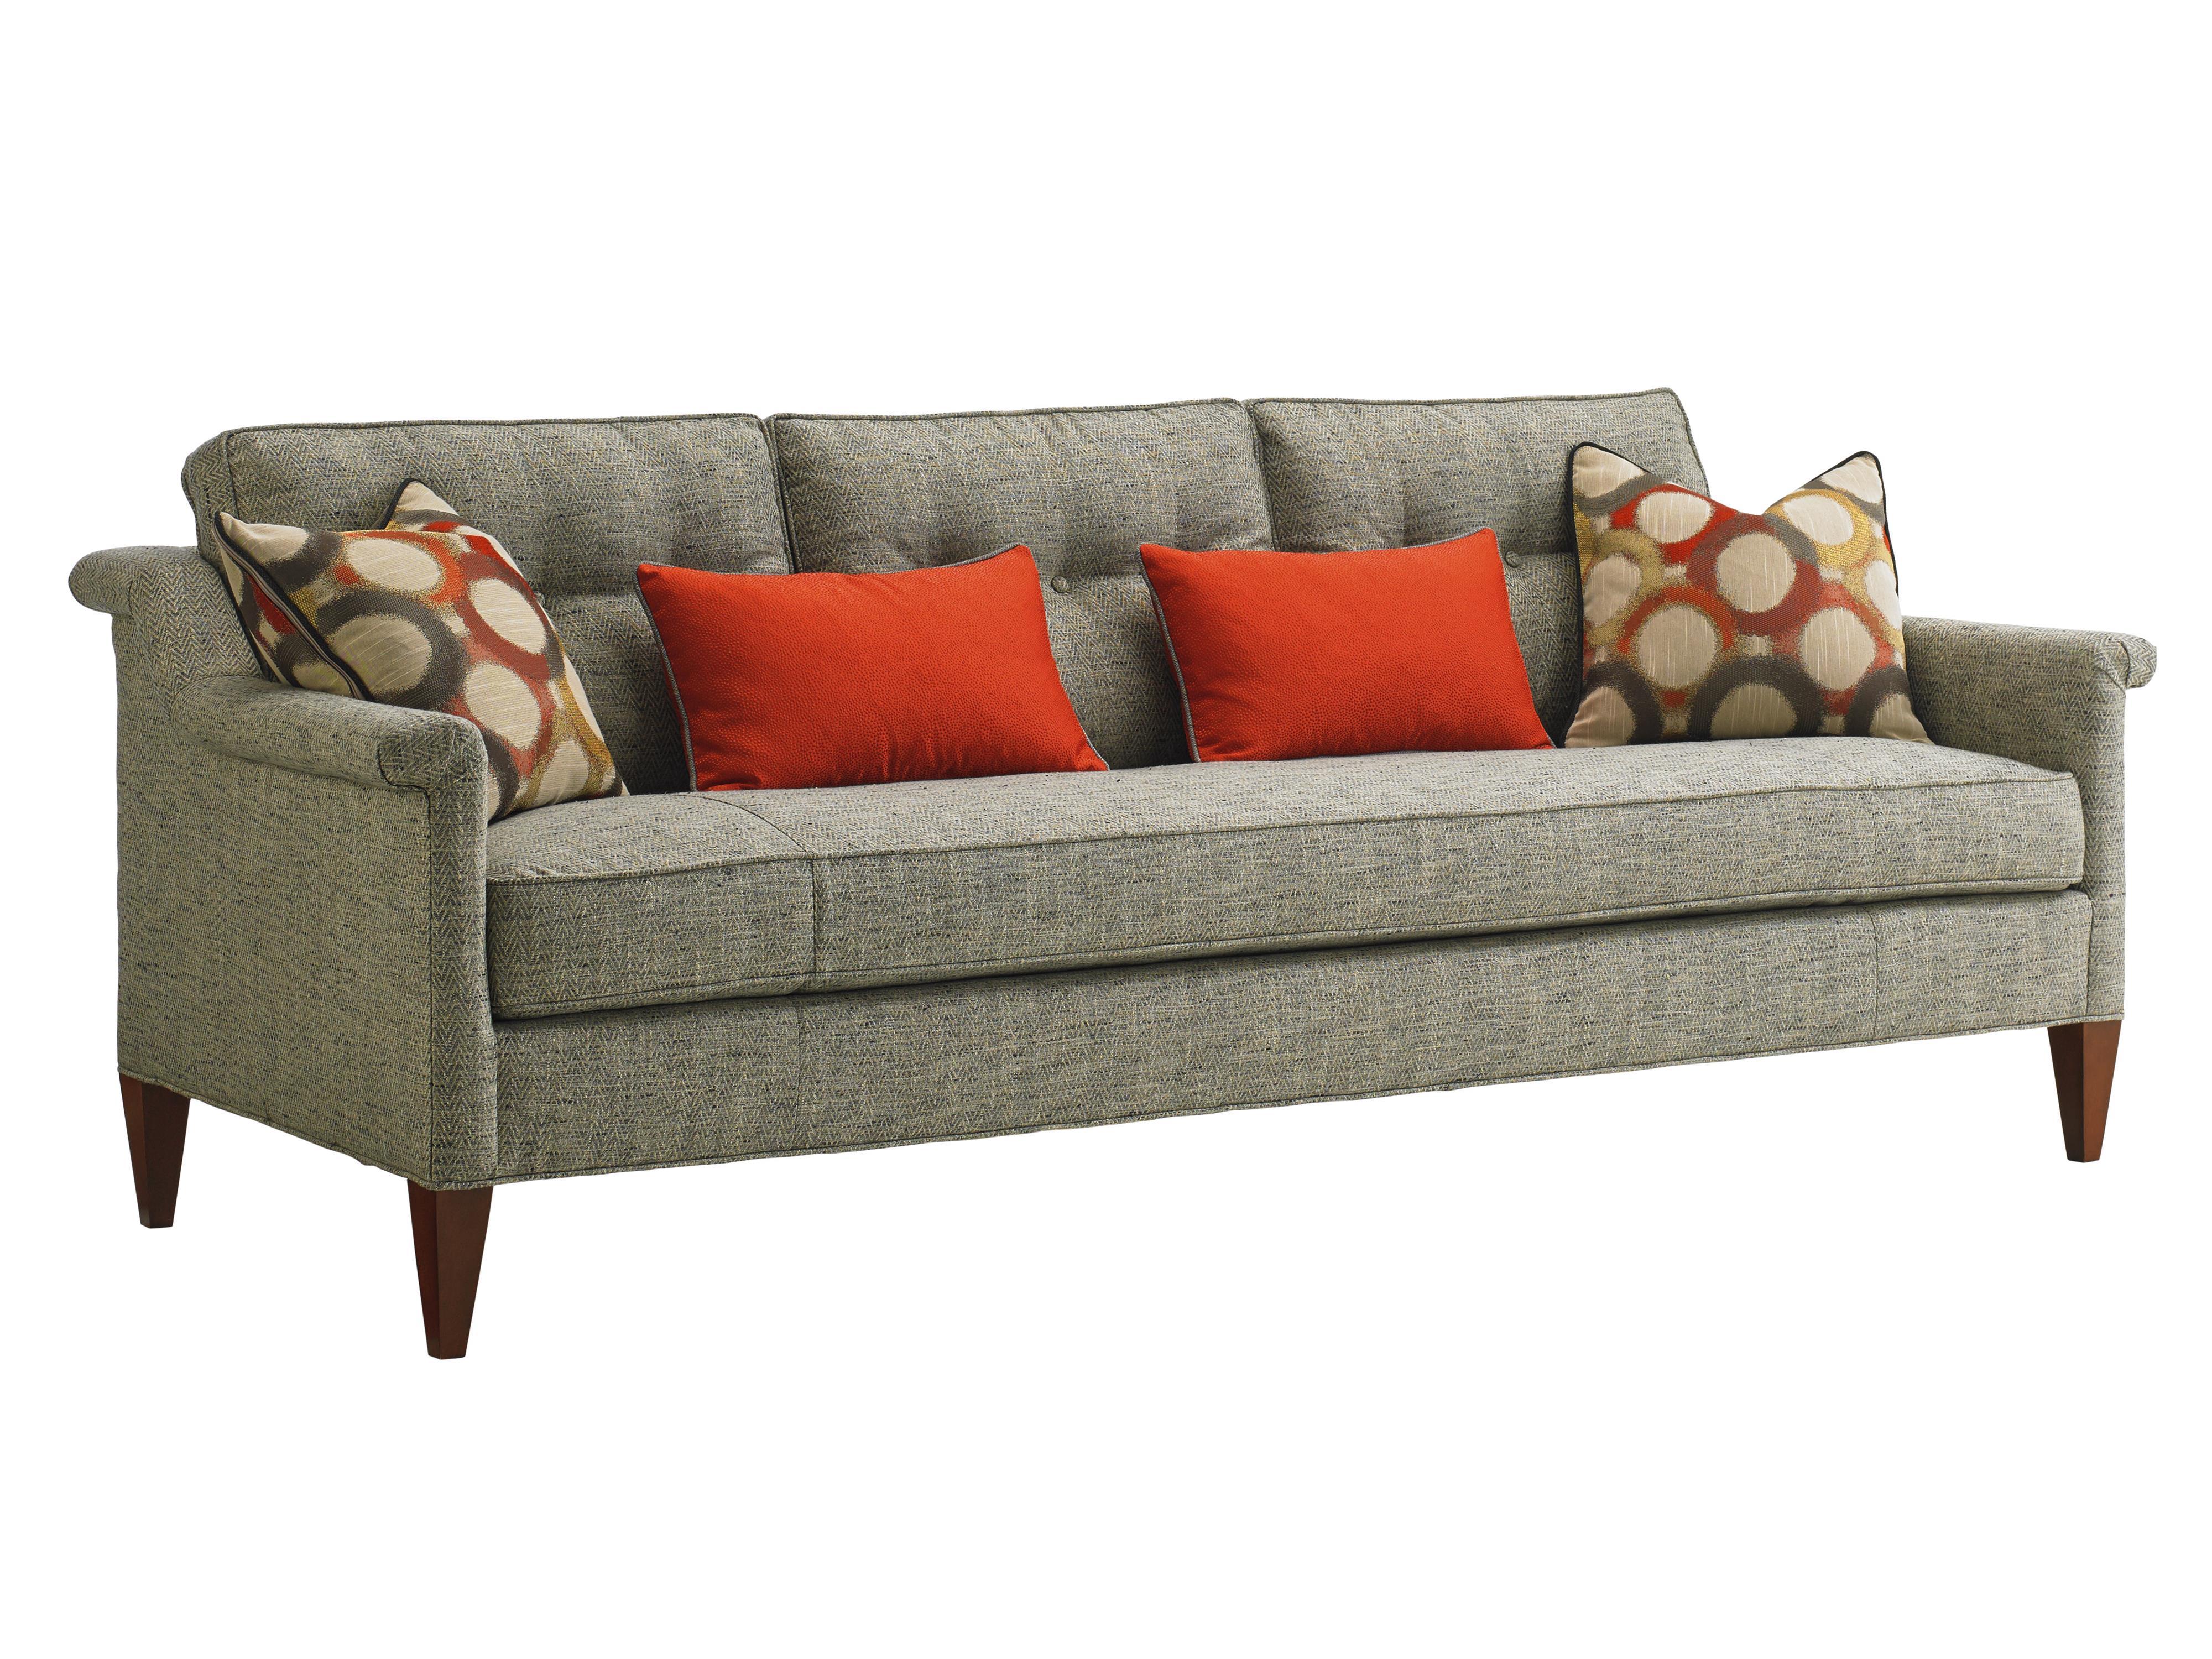 TAKE FIVE Whitehall Sofa by Lexington at Baer's Furniture